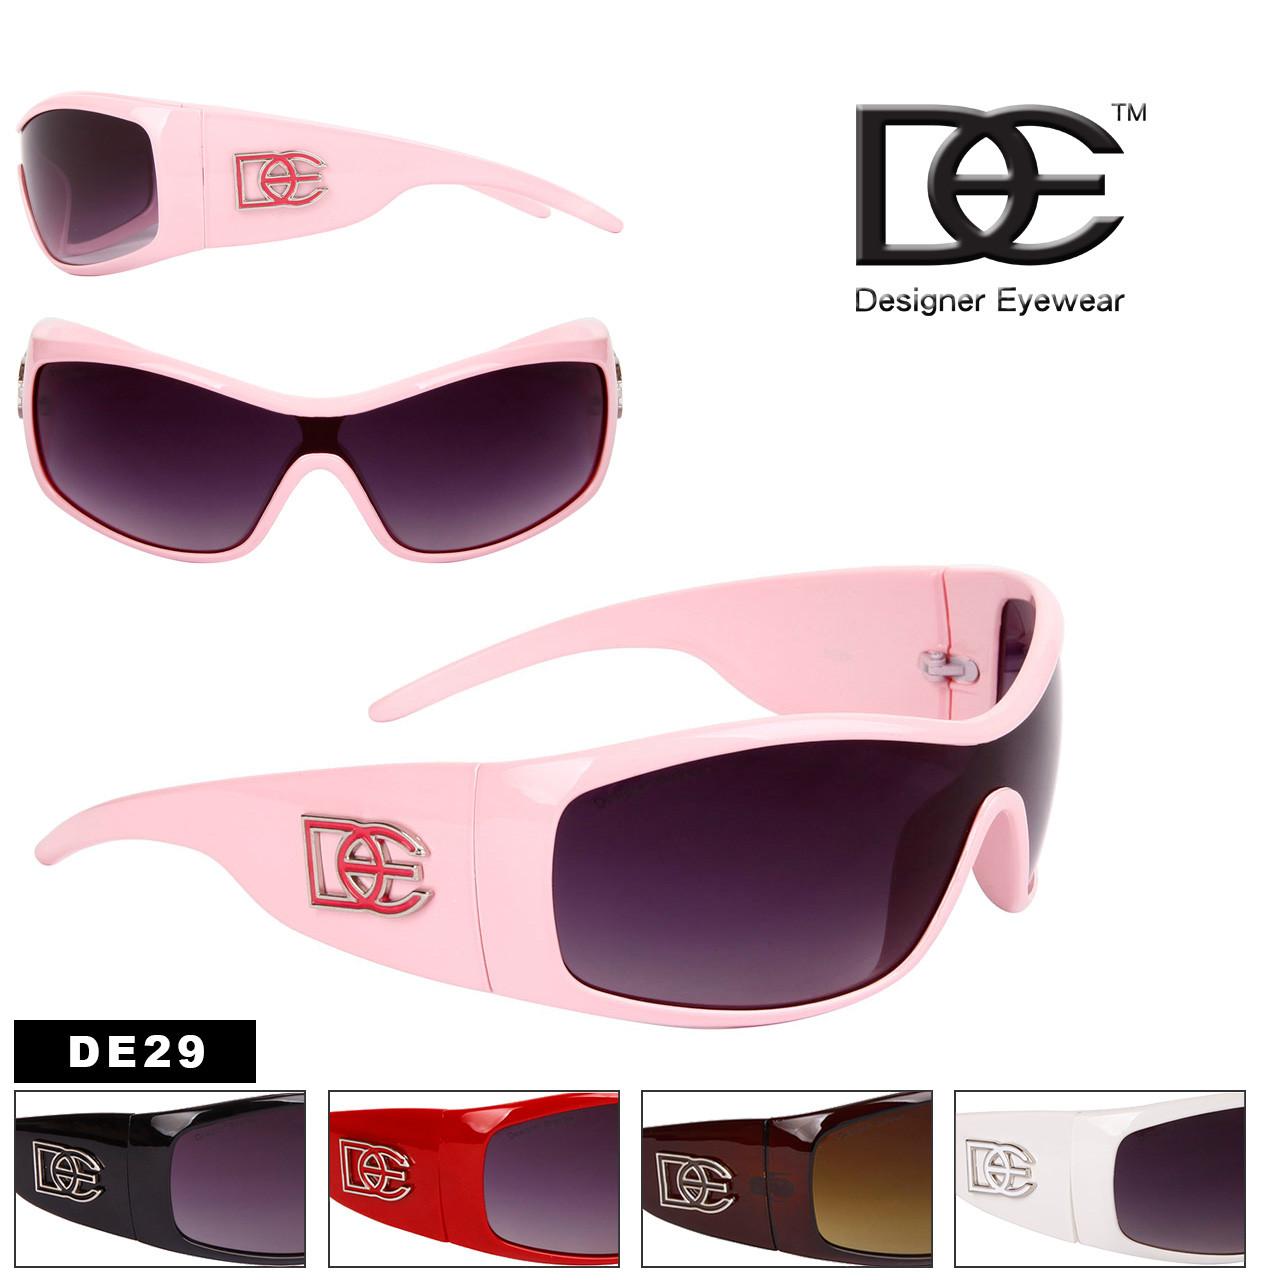 DE Designer Eyewear Single Piece Lens - Style #DE29 (Assorted Colors) (12 pcs.)